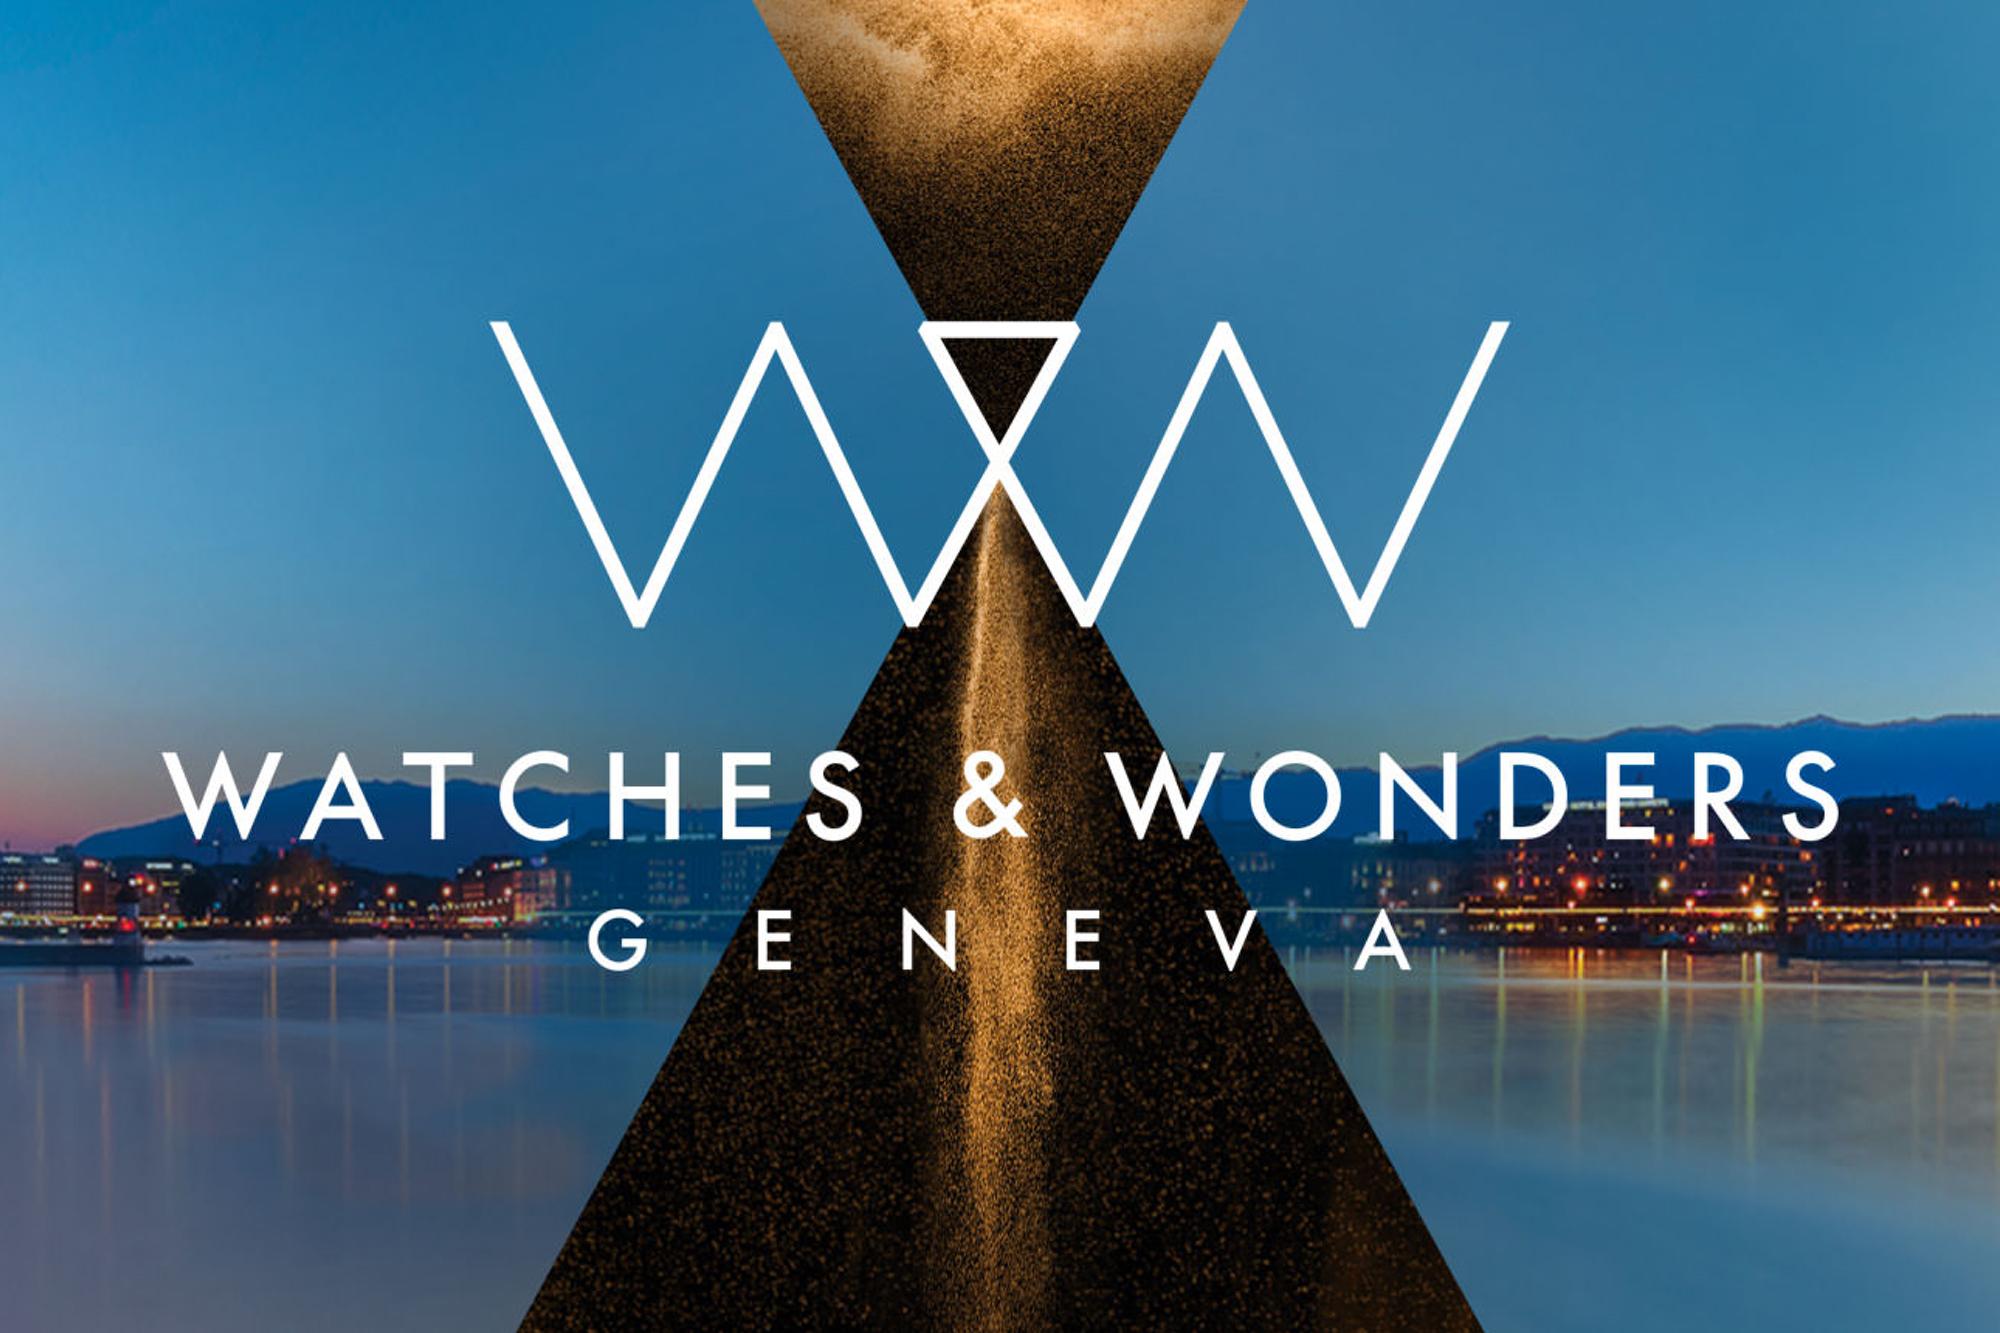 Watches & Wonders 2020 annulé